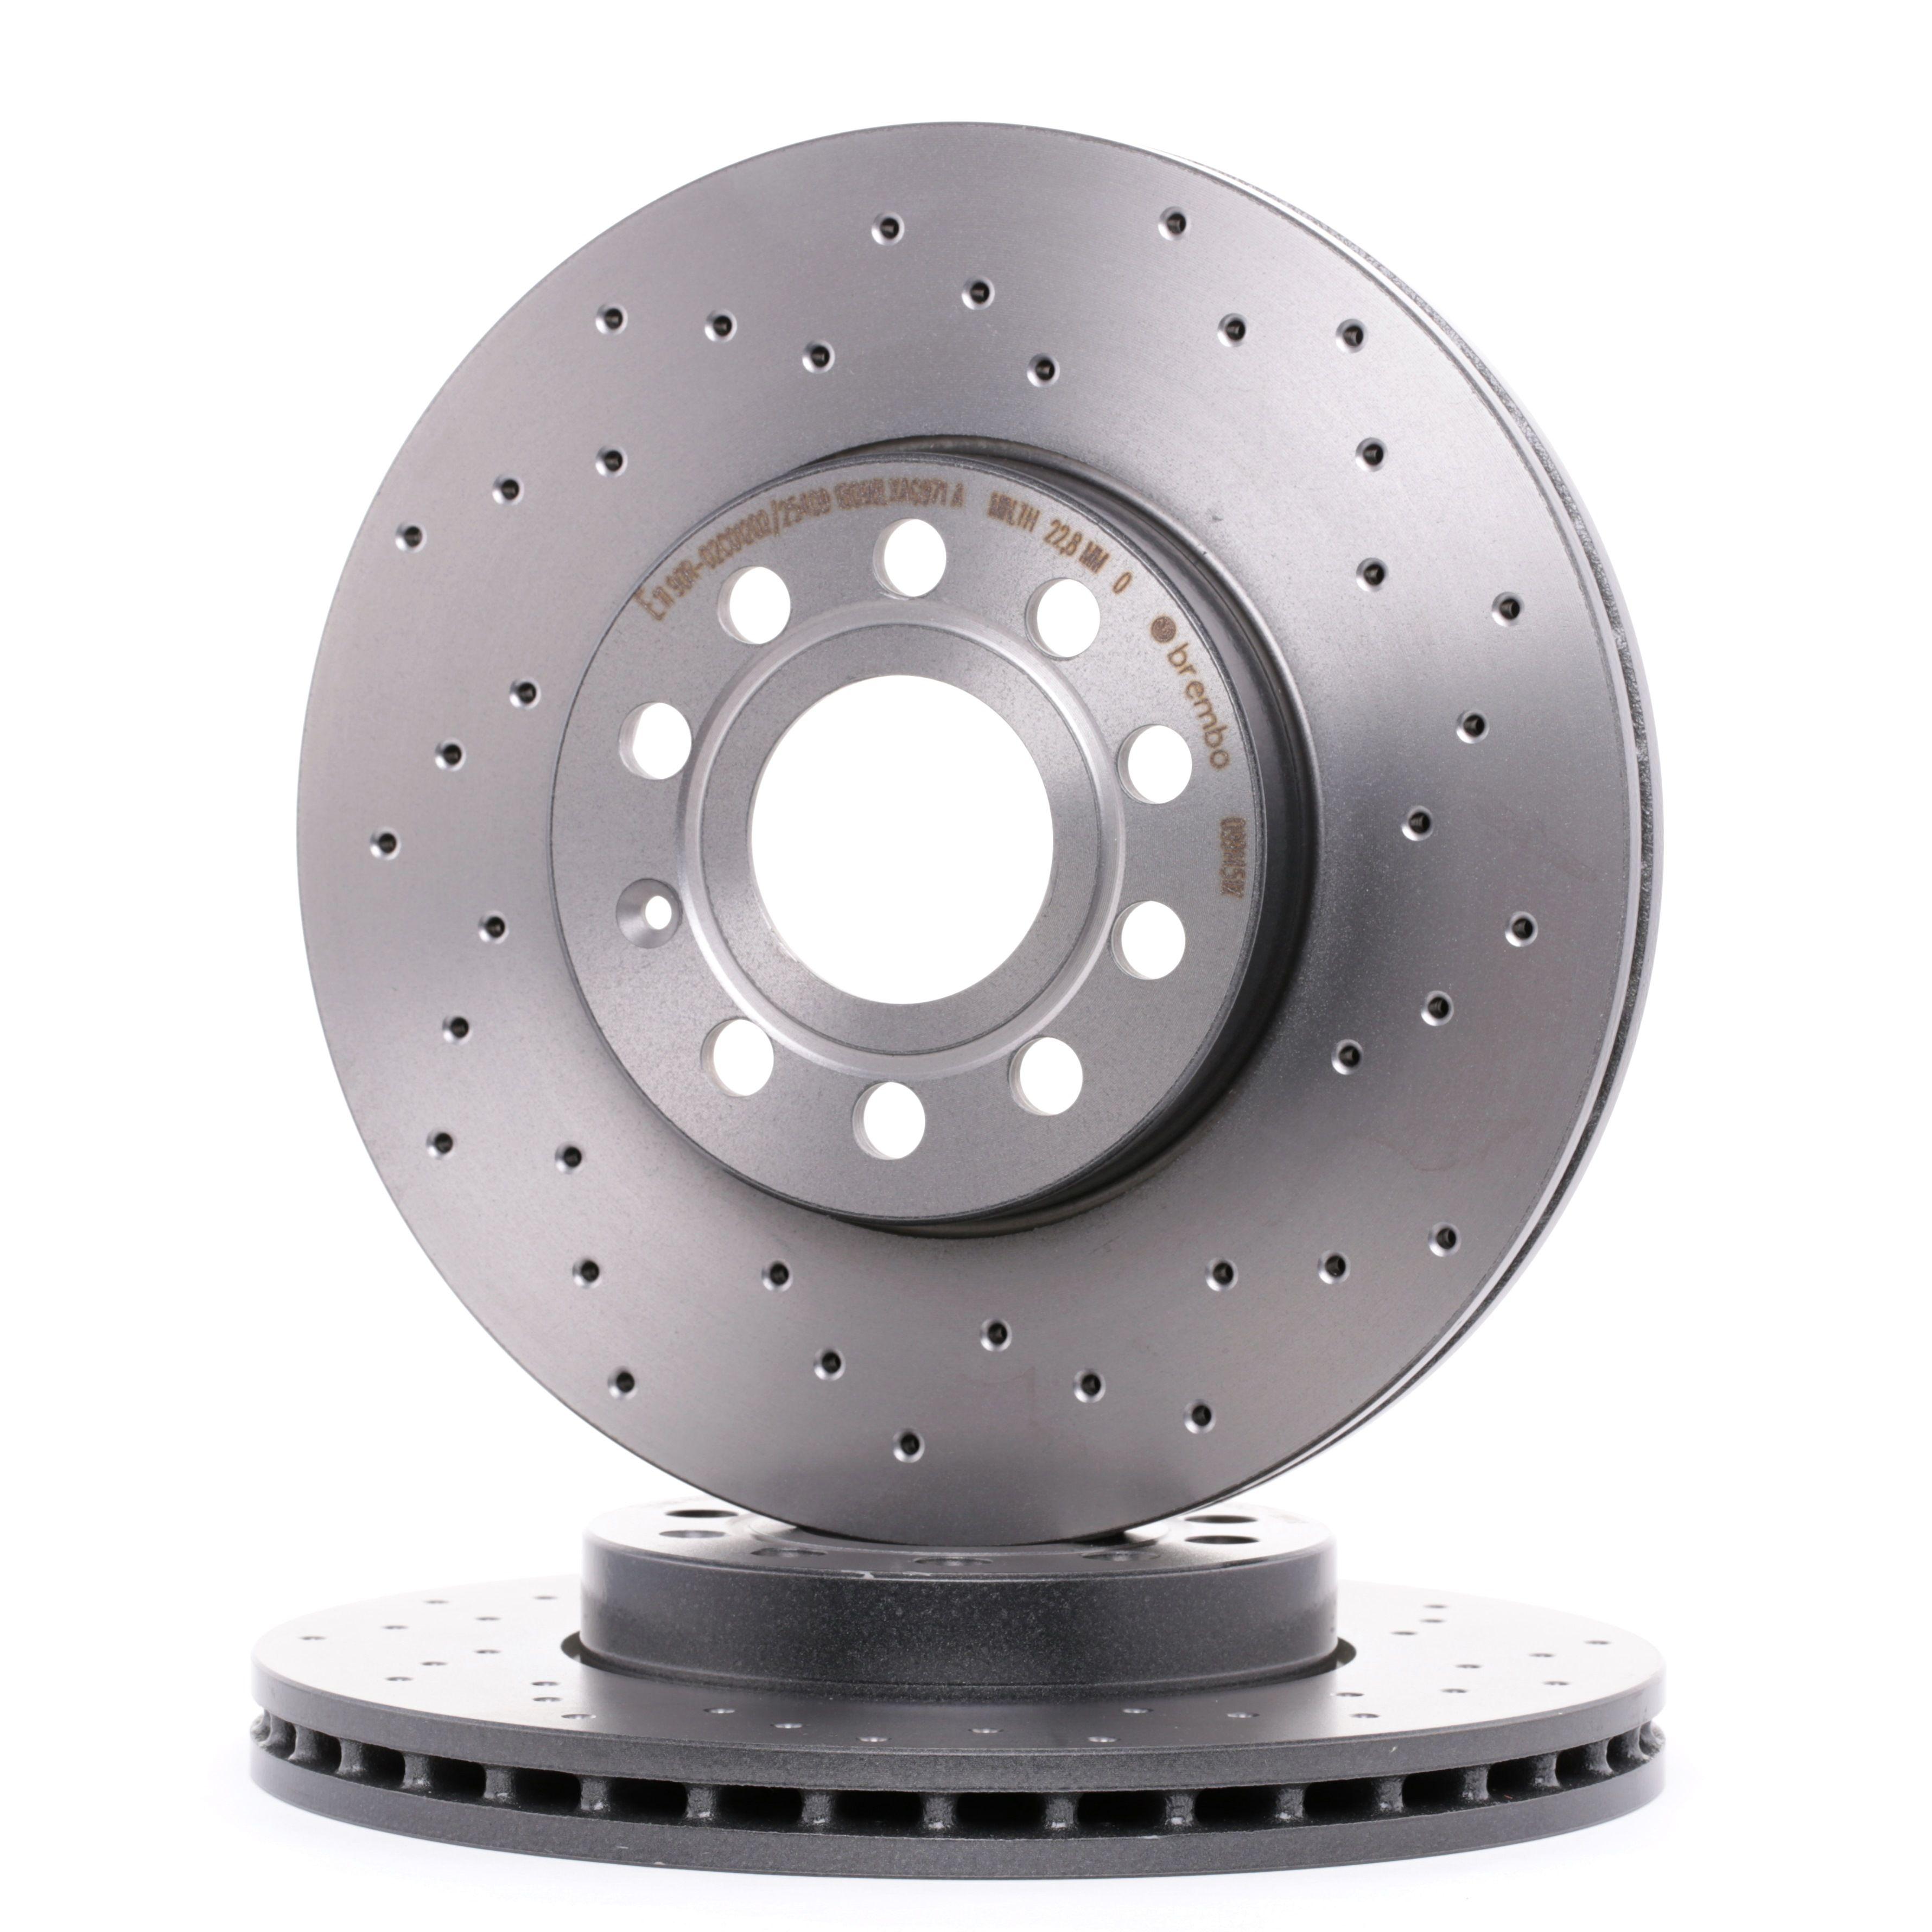 Buy Brake rotors set BREMBO 09.9145.1X Ø: 288mm, Num. of holes: 5, Brake Disc Thickness: 25mm